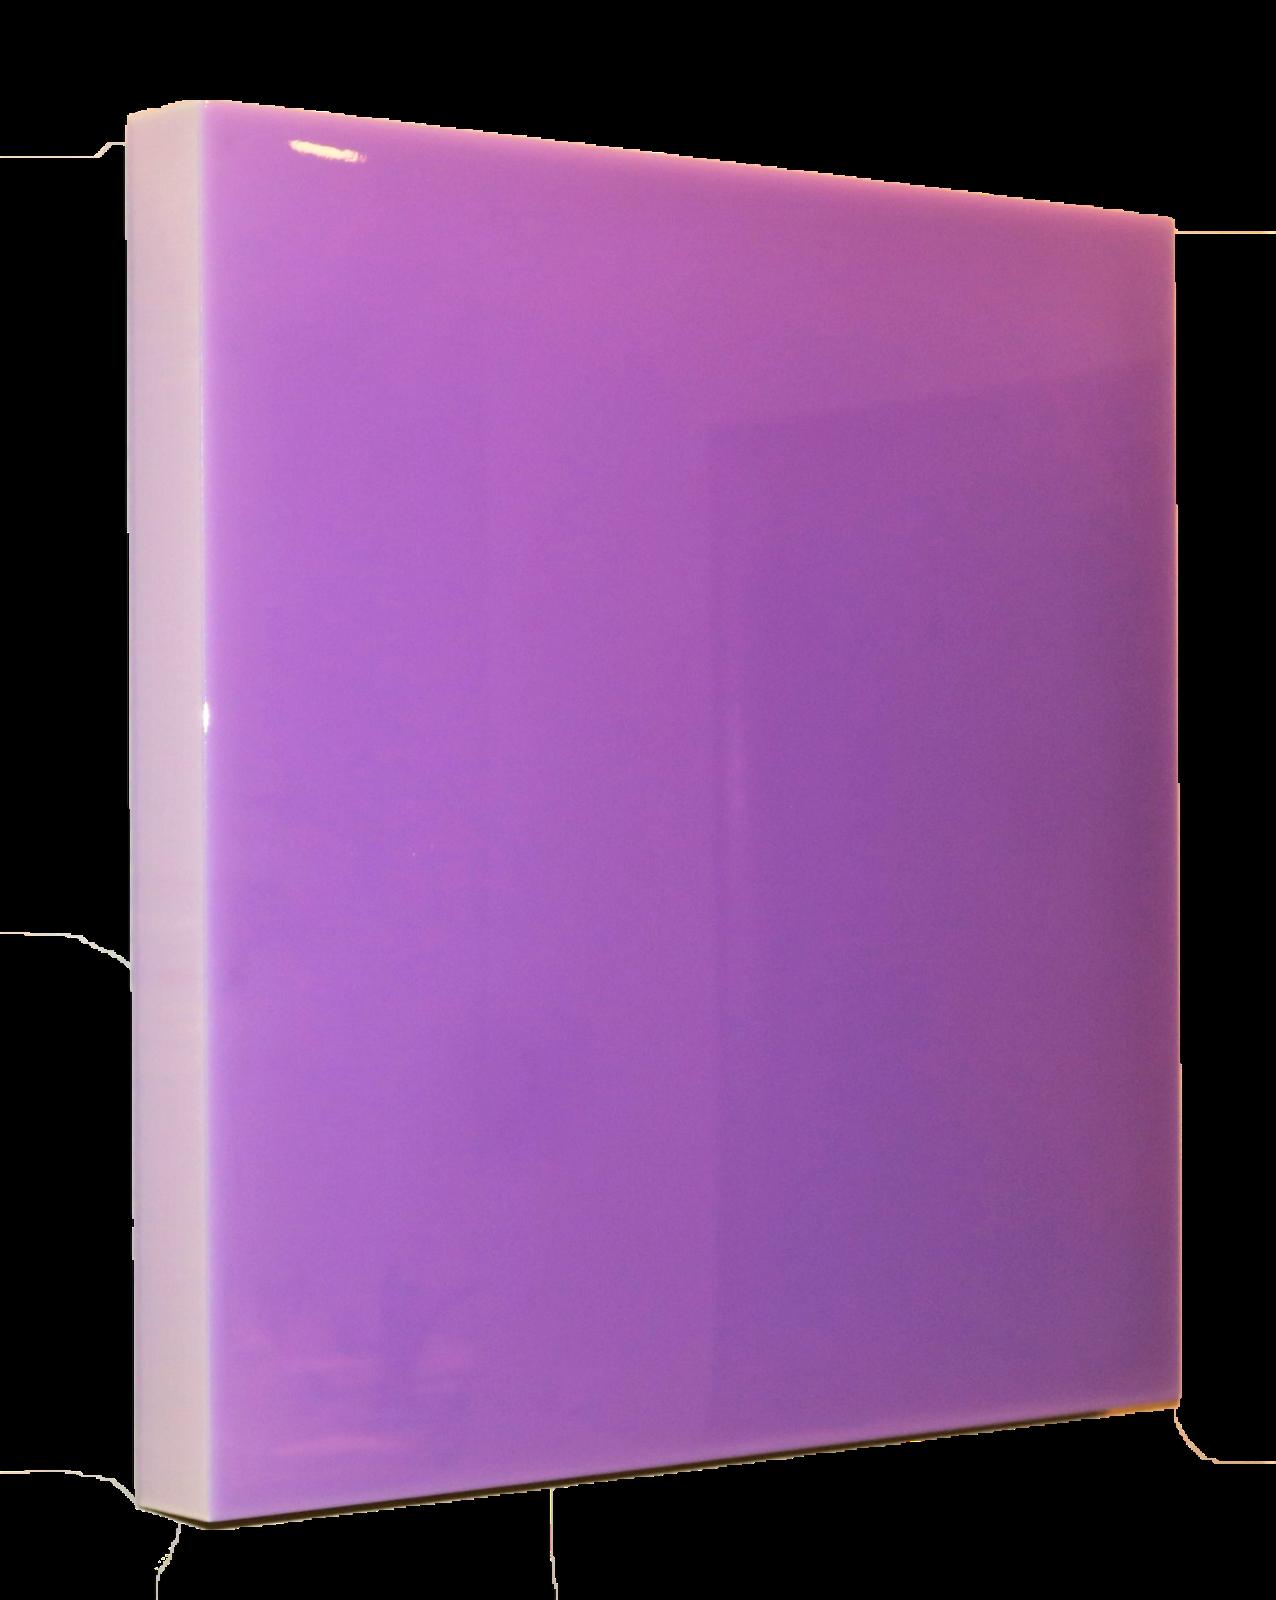 Rockstar Crystal Clear Premium Epoxy Resin - 32oz Kit - 4-Star 9